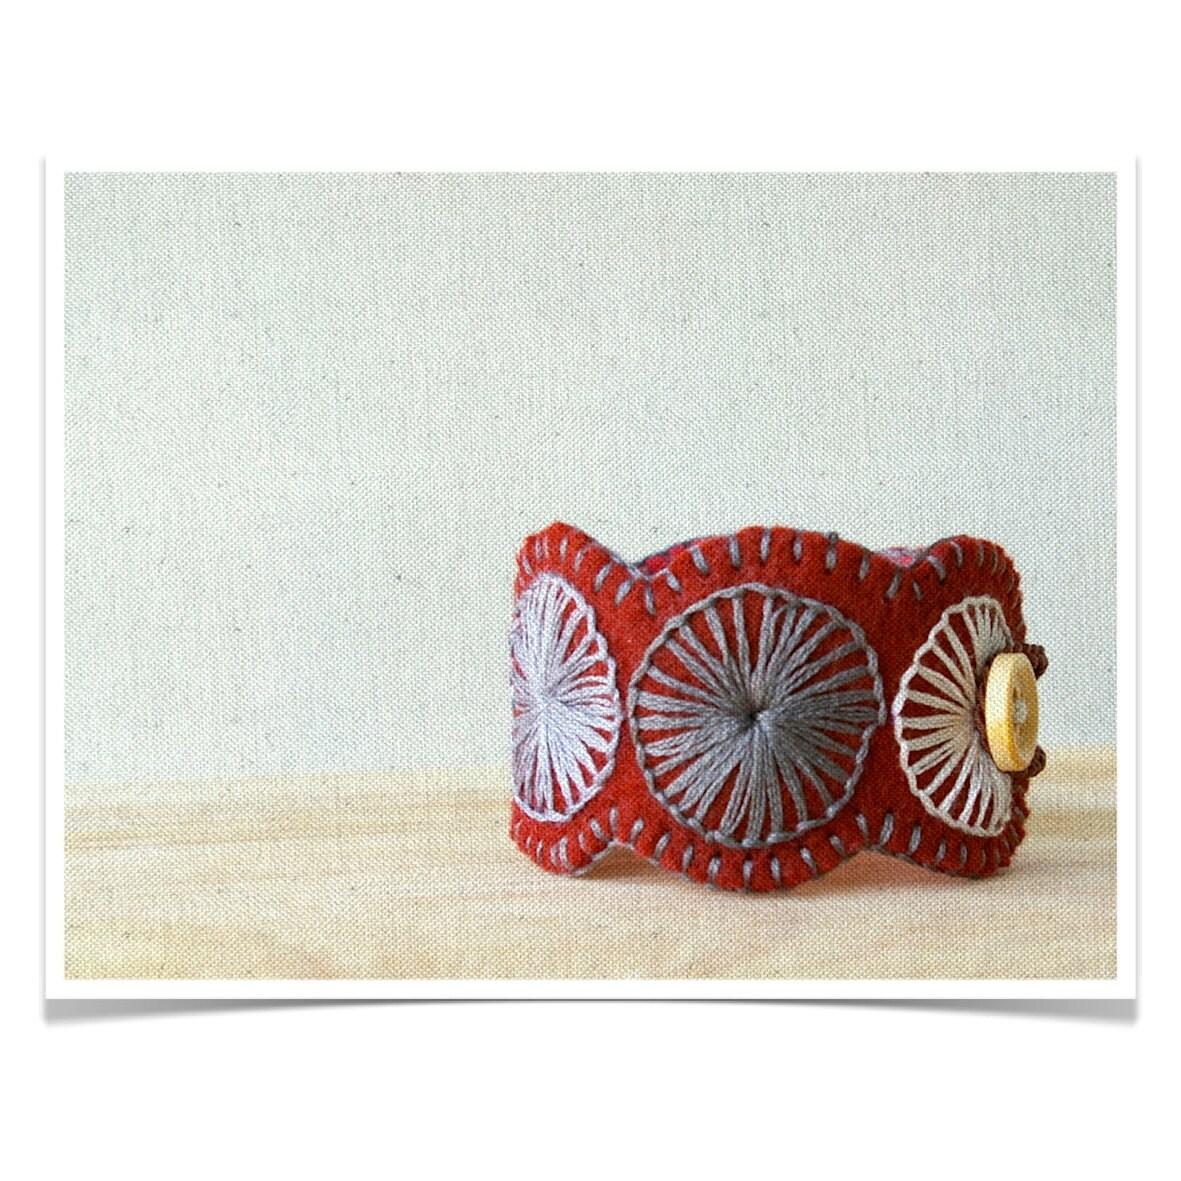 Wool Felt Bracelet Wristband Cuff // Hand Embroidered // Burgundy // LoftFullOfGoodies - LoftFullOfGoodies